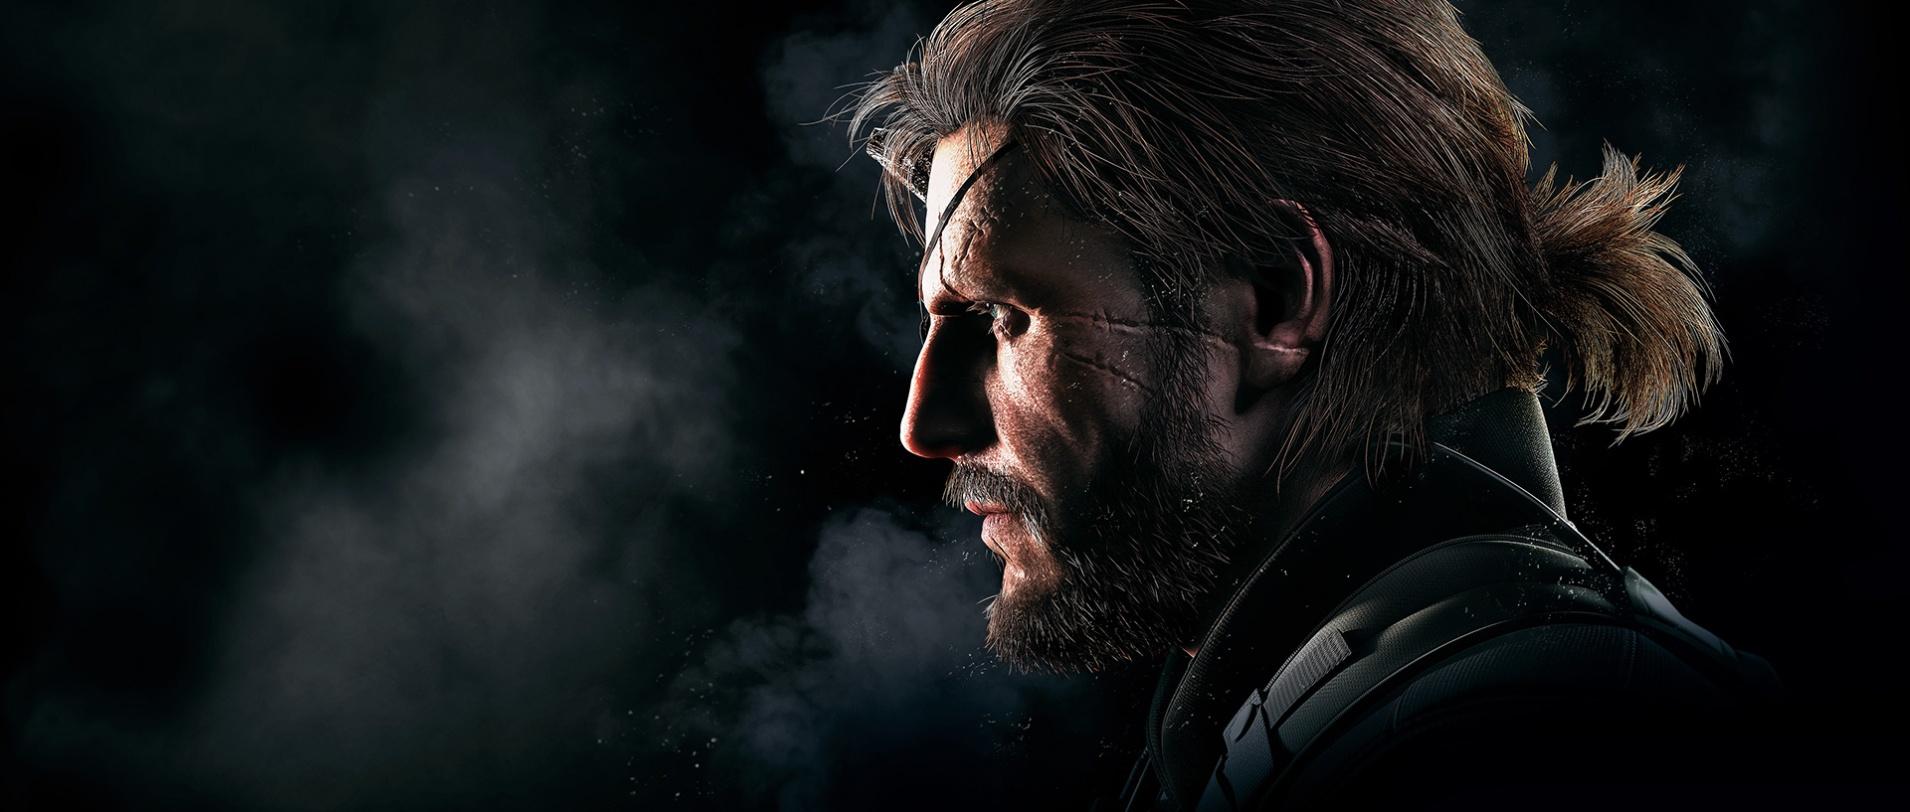 Metal Gear Solid V - Solid Snake - The Phantom Pain